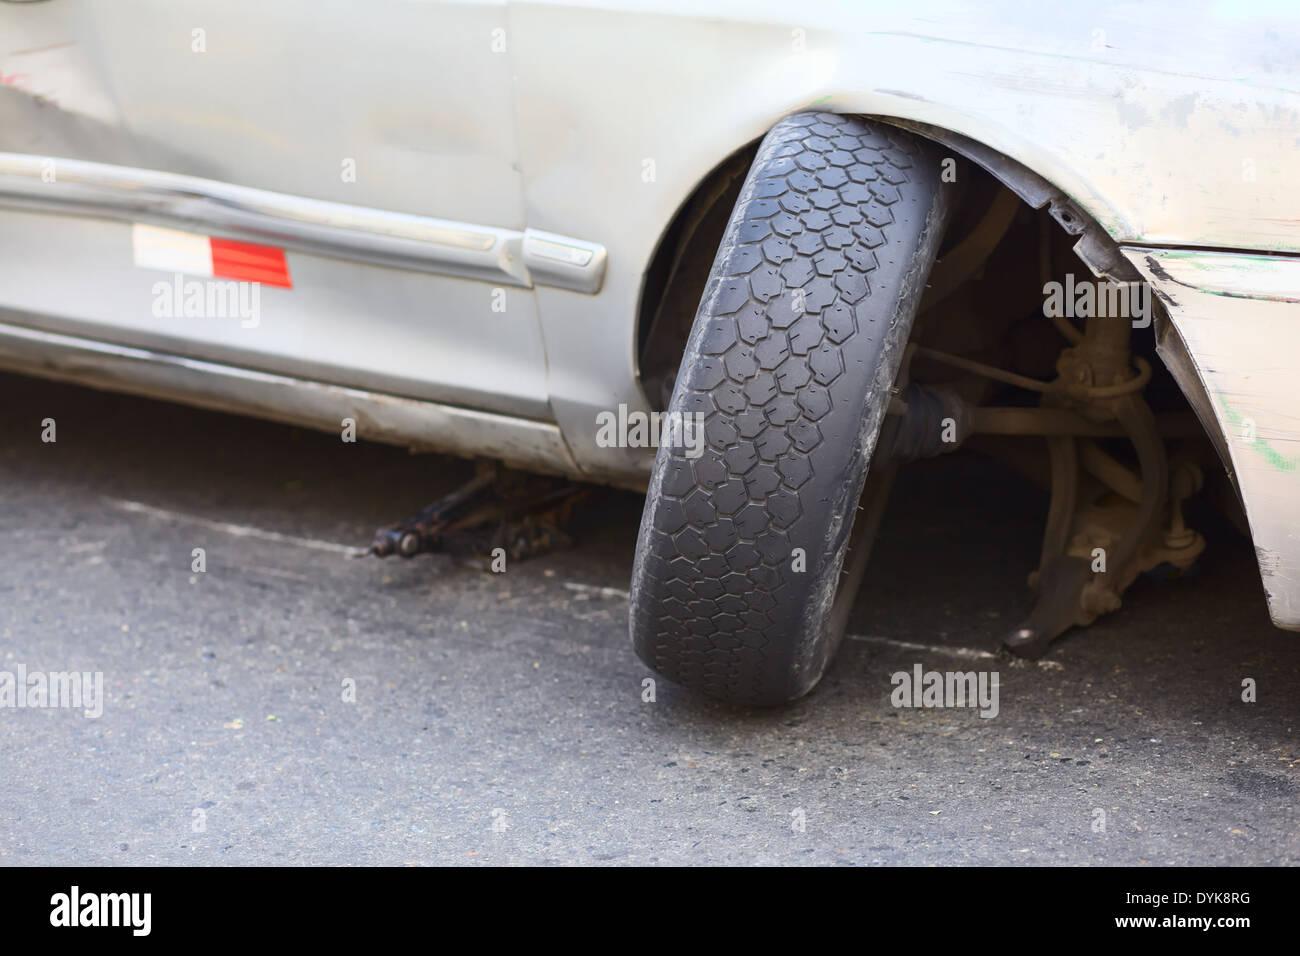 Car Axle Stock Photos & Car Axle Stock Images - Alamy